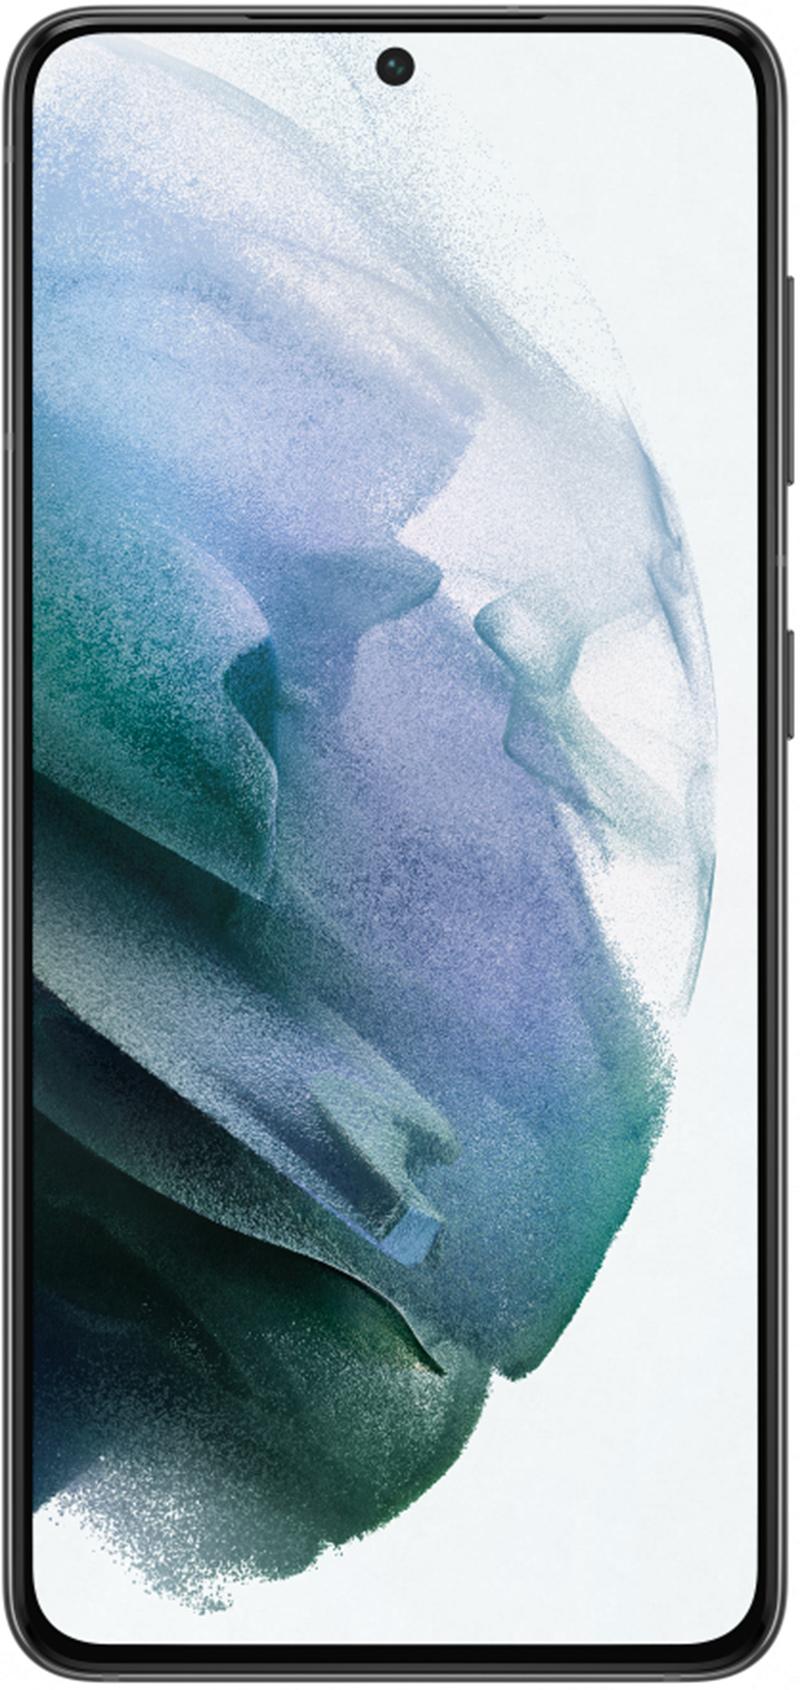 Samsung Galaxy S21 Plus 5G noir 256Go